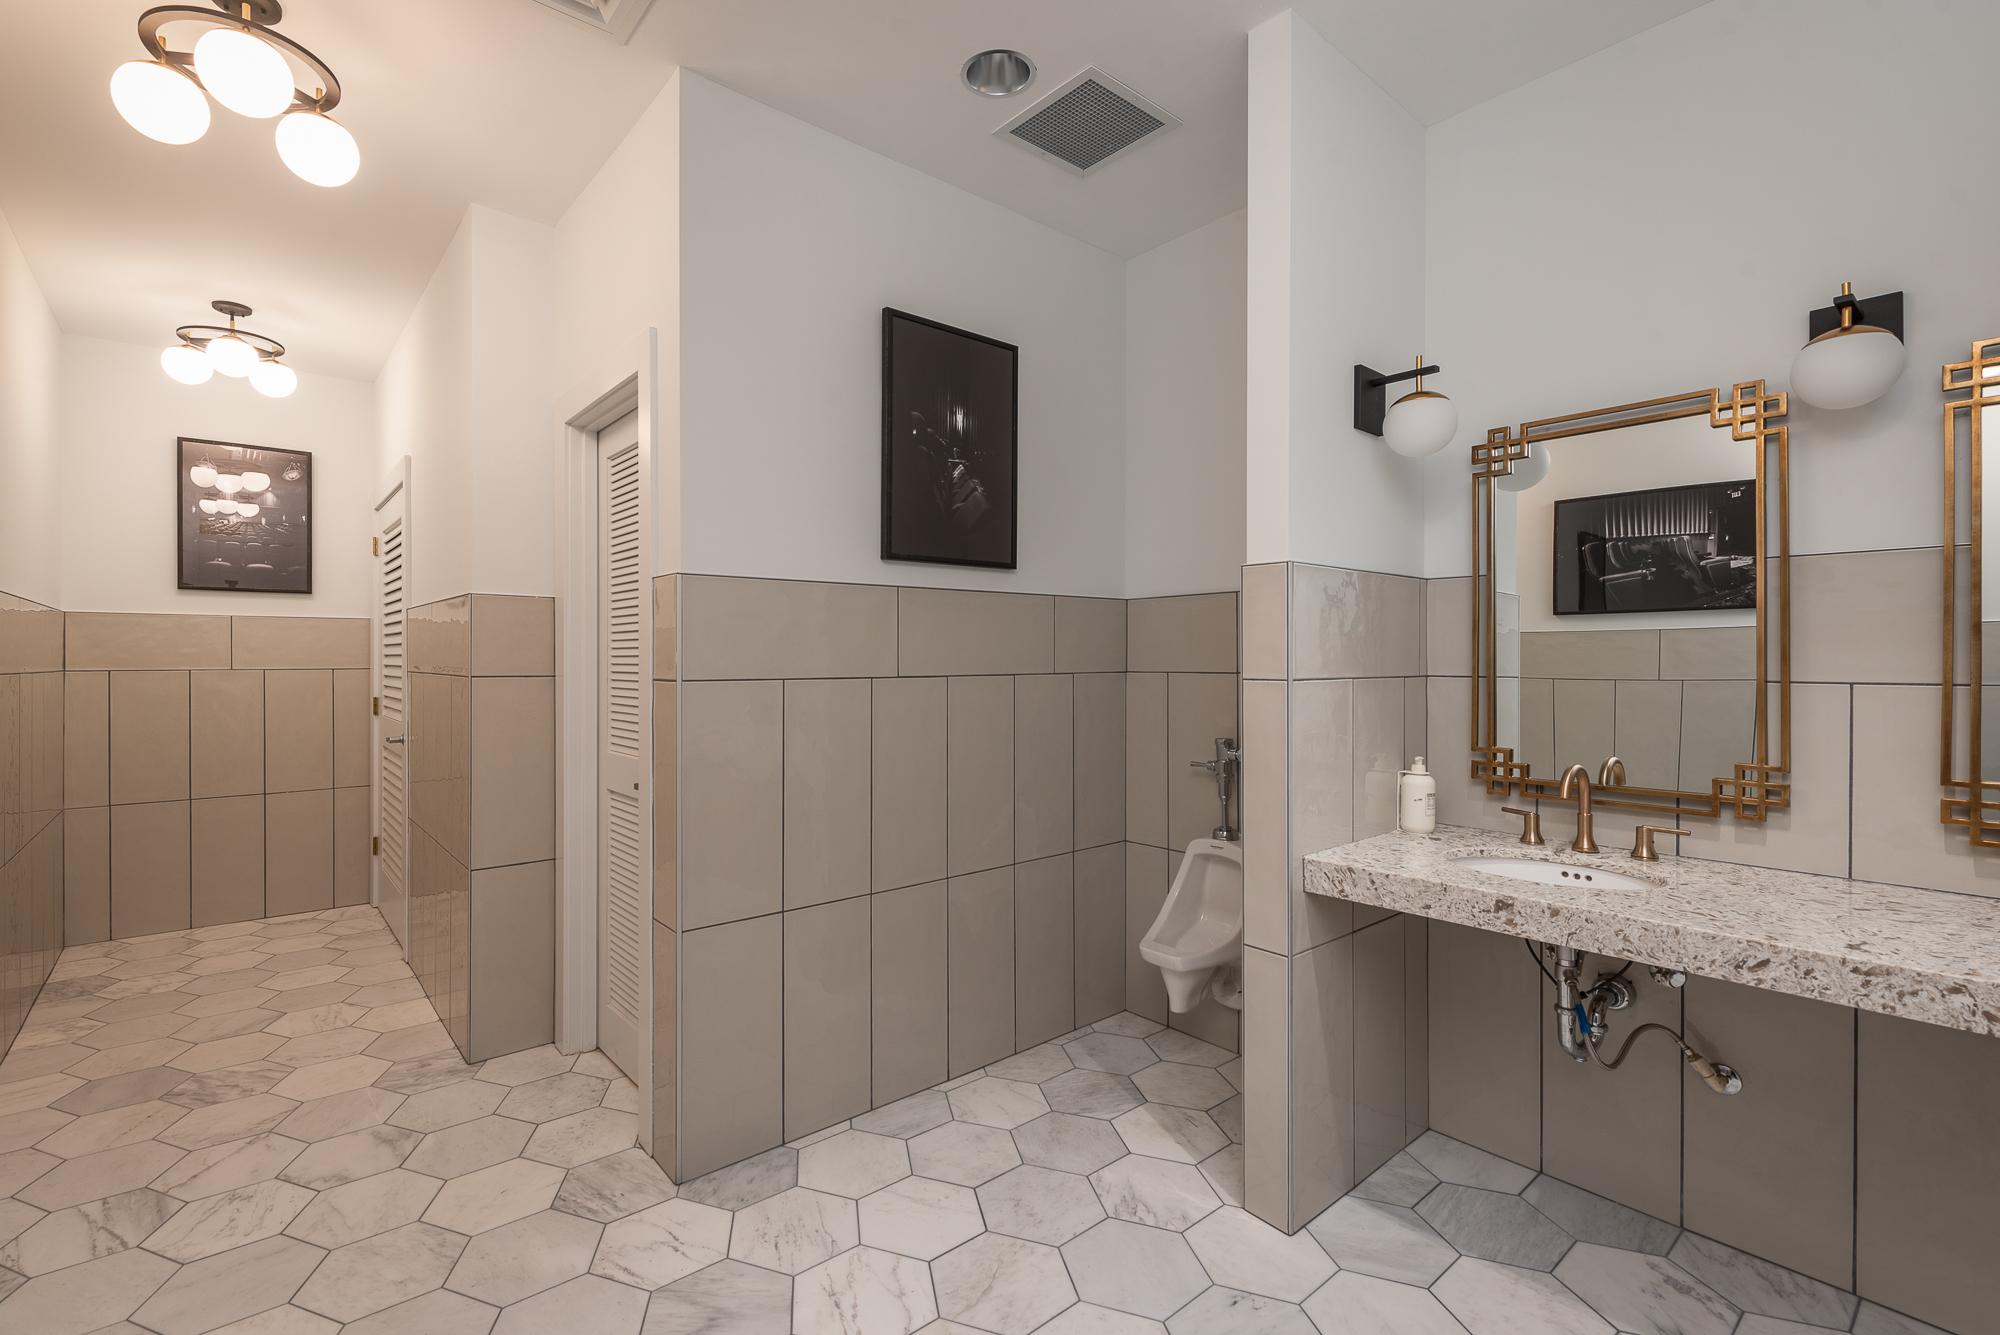 Micamy Design Studio_Interior Design_Clay Theatre_Event Space_Venue_Wedding_Art Deco_Modern_Marble Tile_Decorative Tile_Restroom_Hexagon.jpg